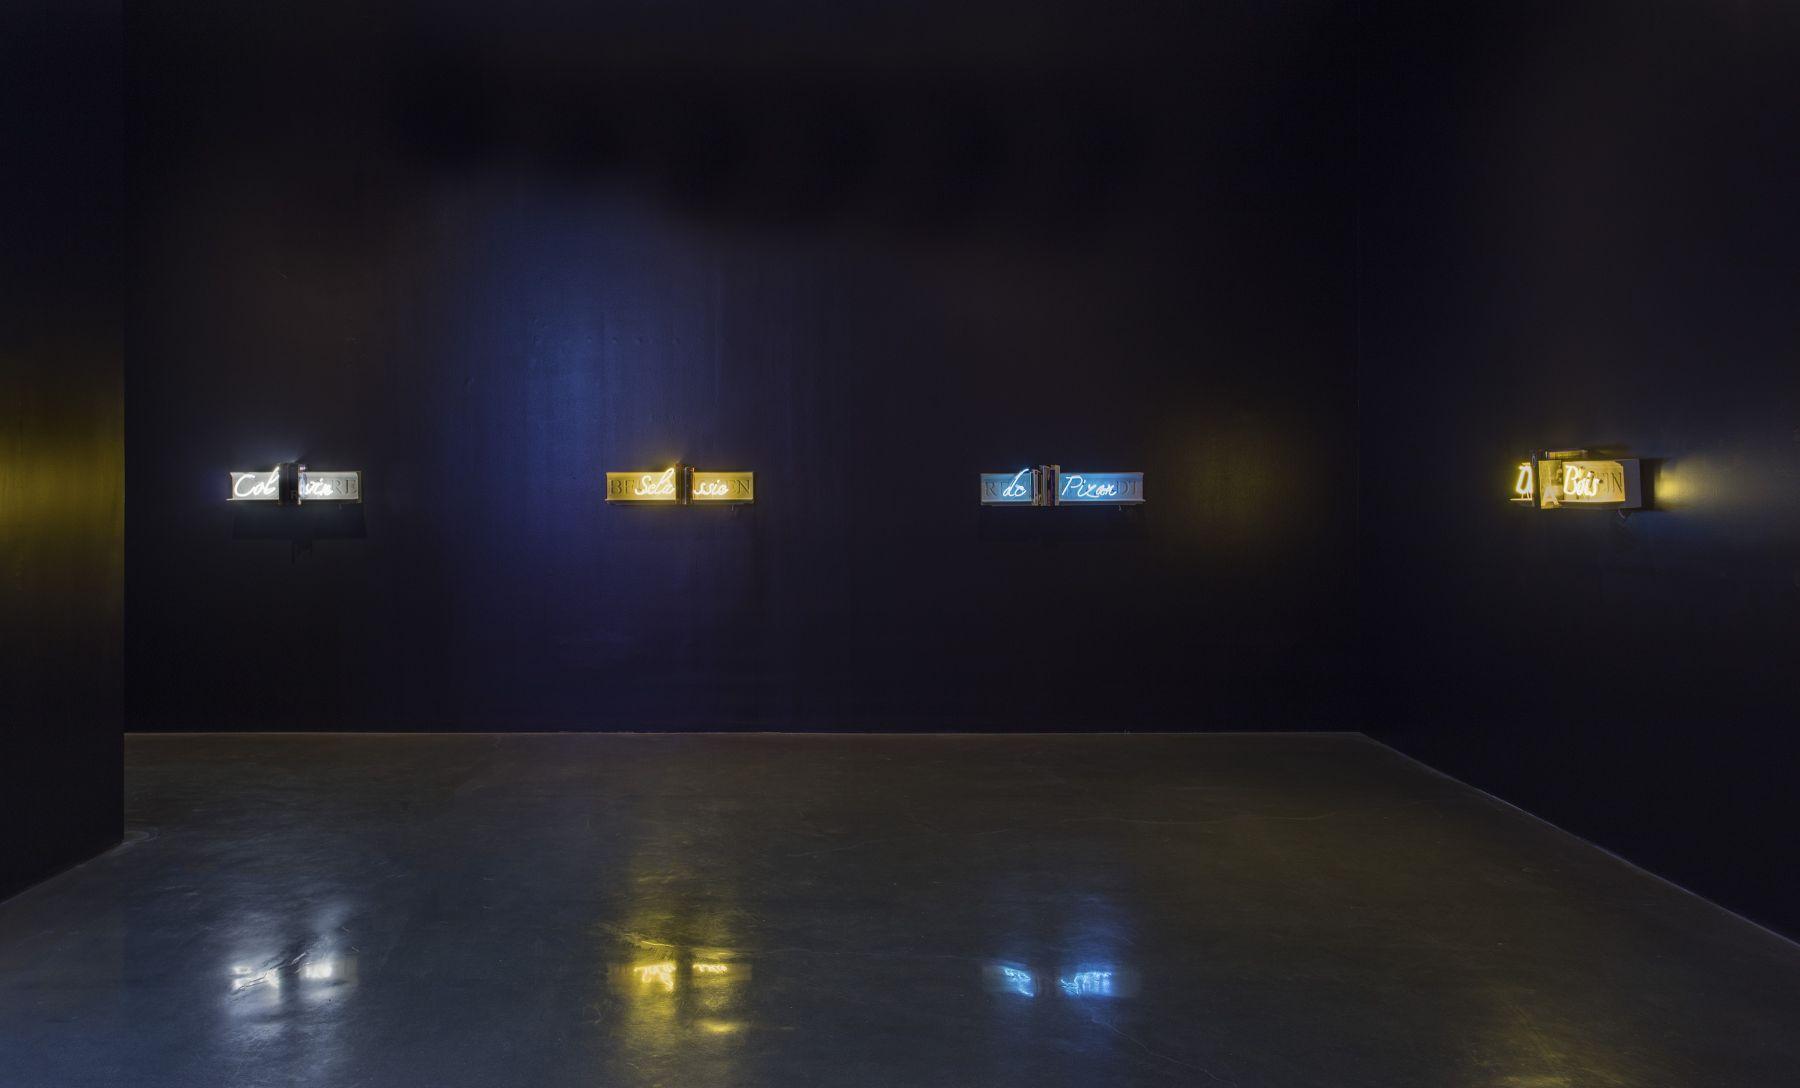 Tavares Strachan - Invisibles